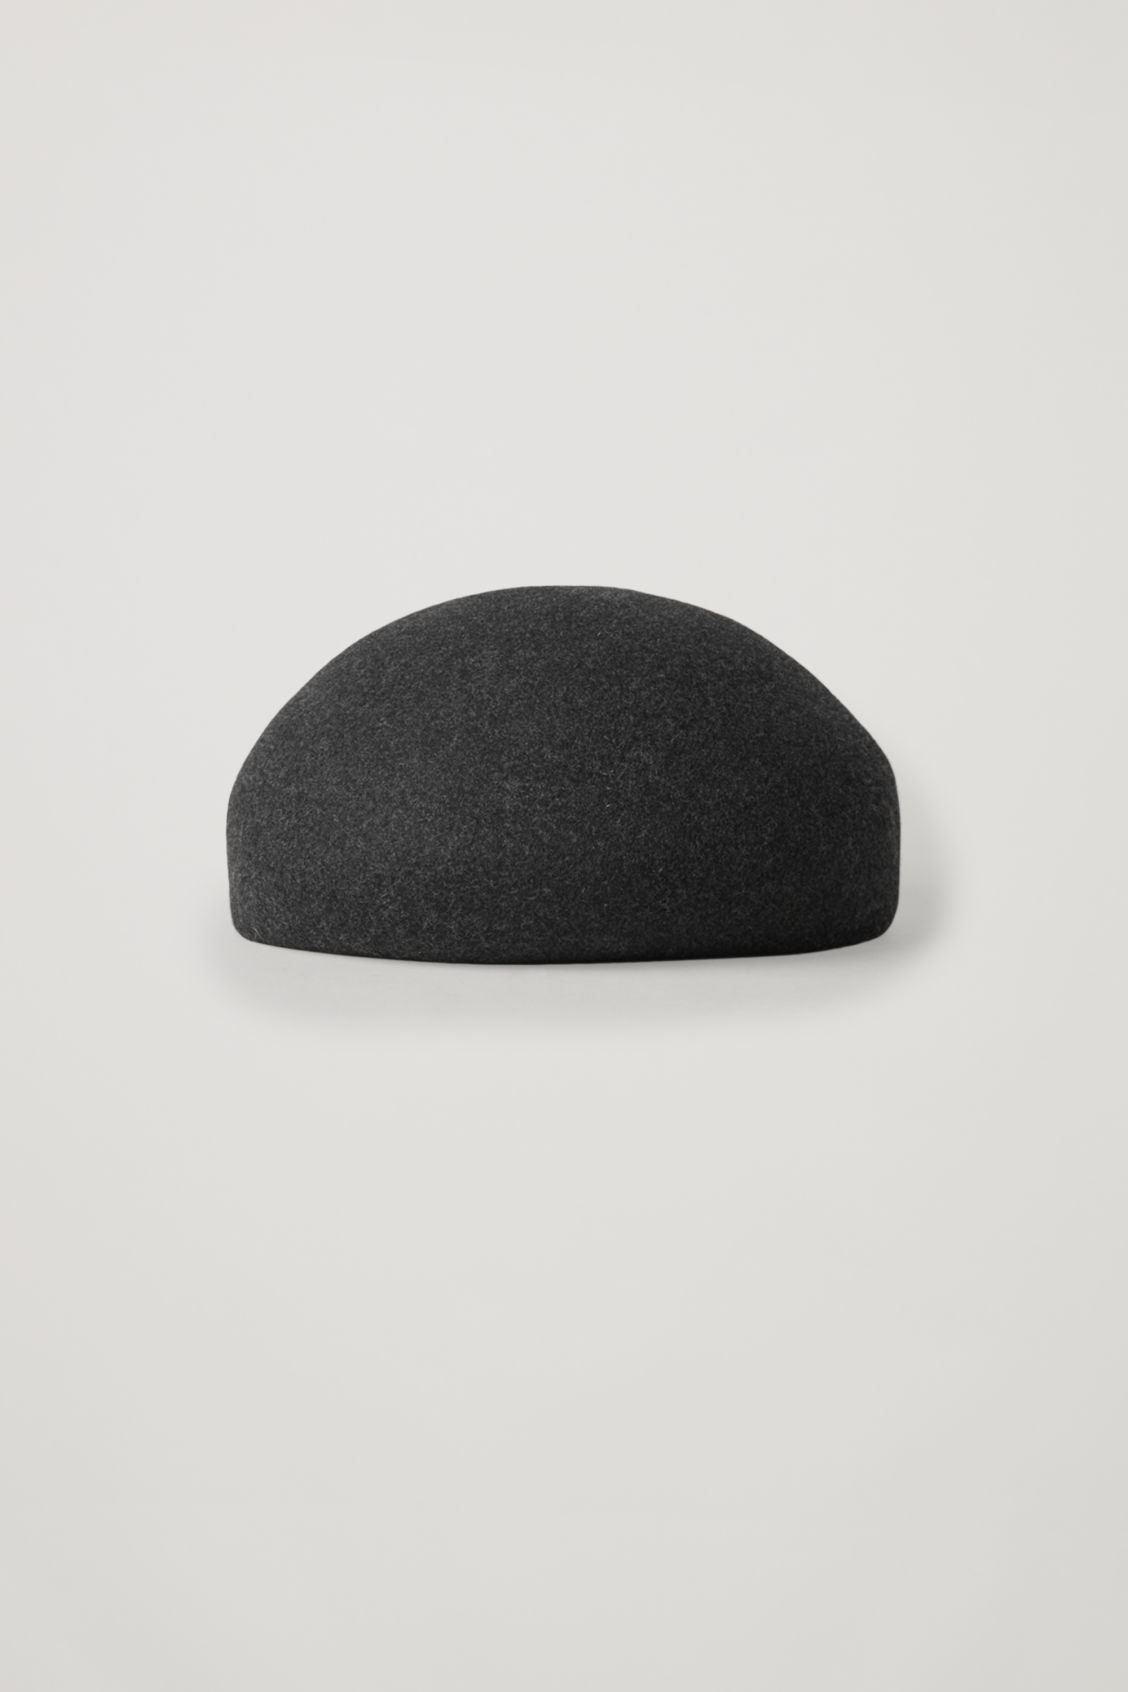 Cos Felt-wool Beret In Grey